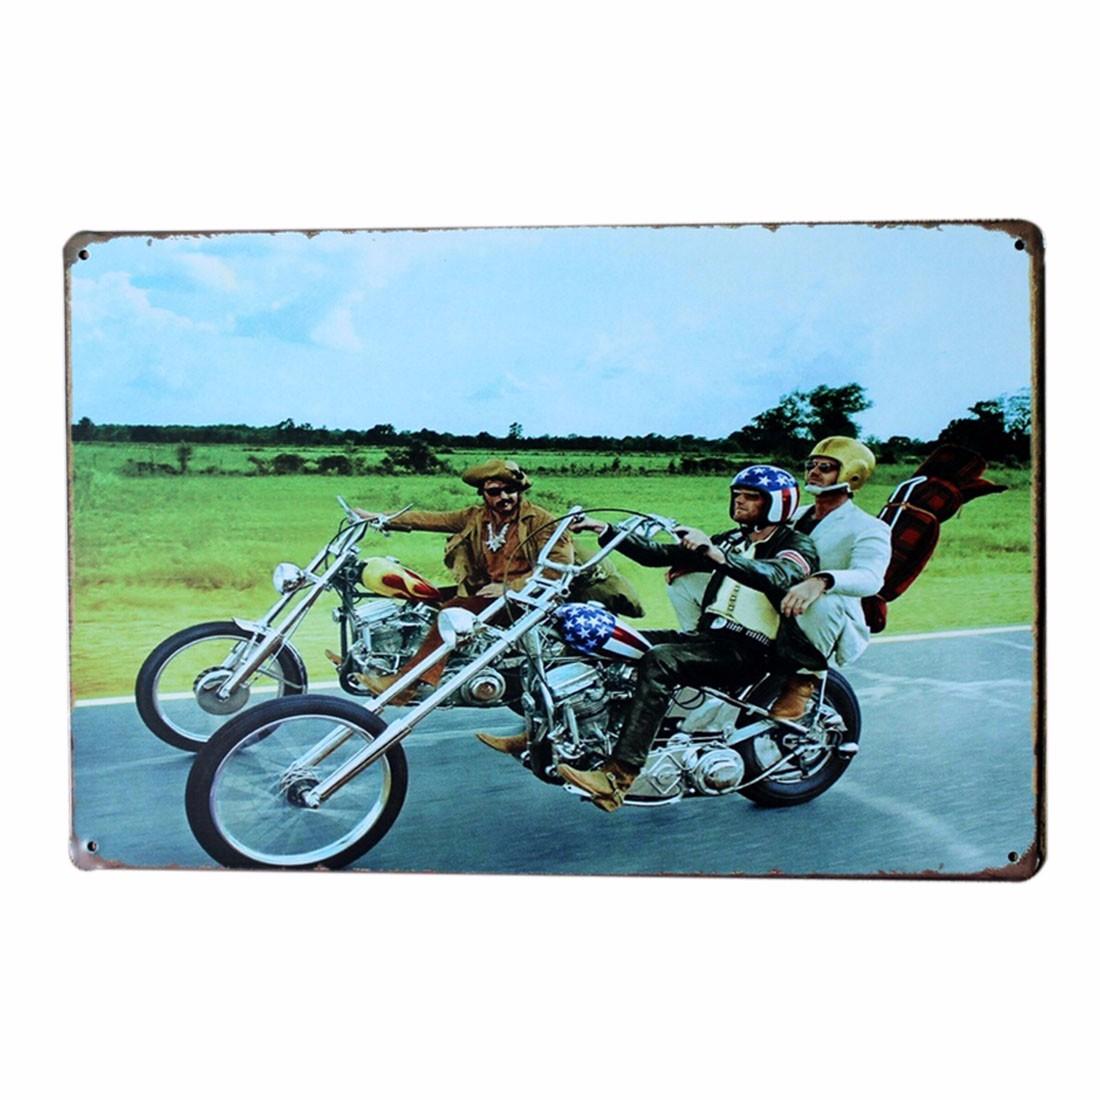 Vintage Motorcycle Metal Tin Signs Home Pub Bar Wall Decor